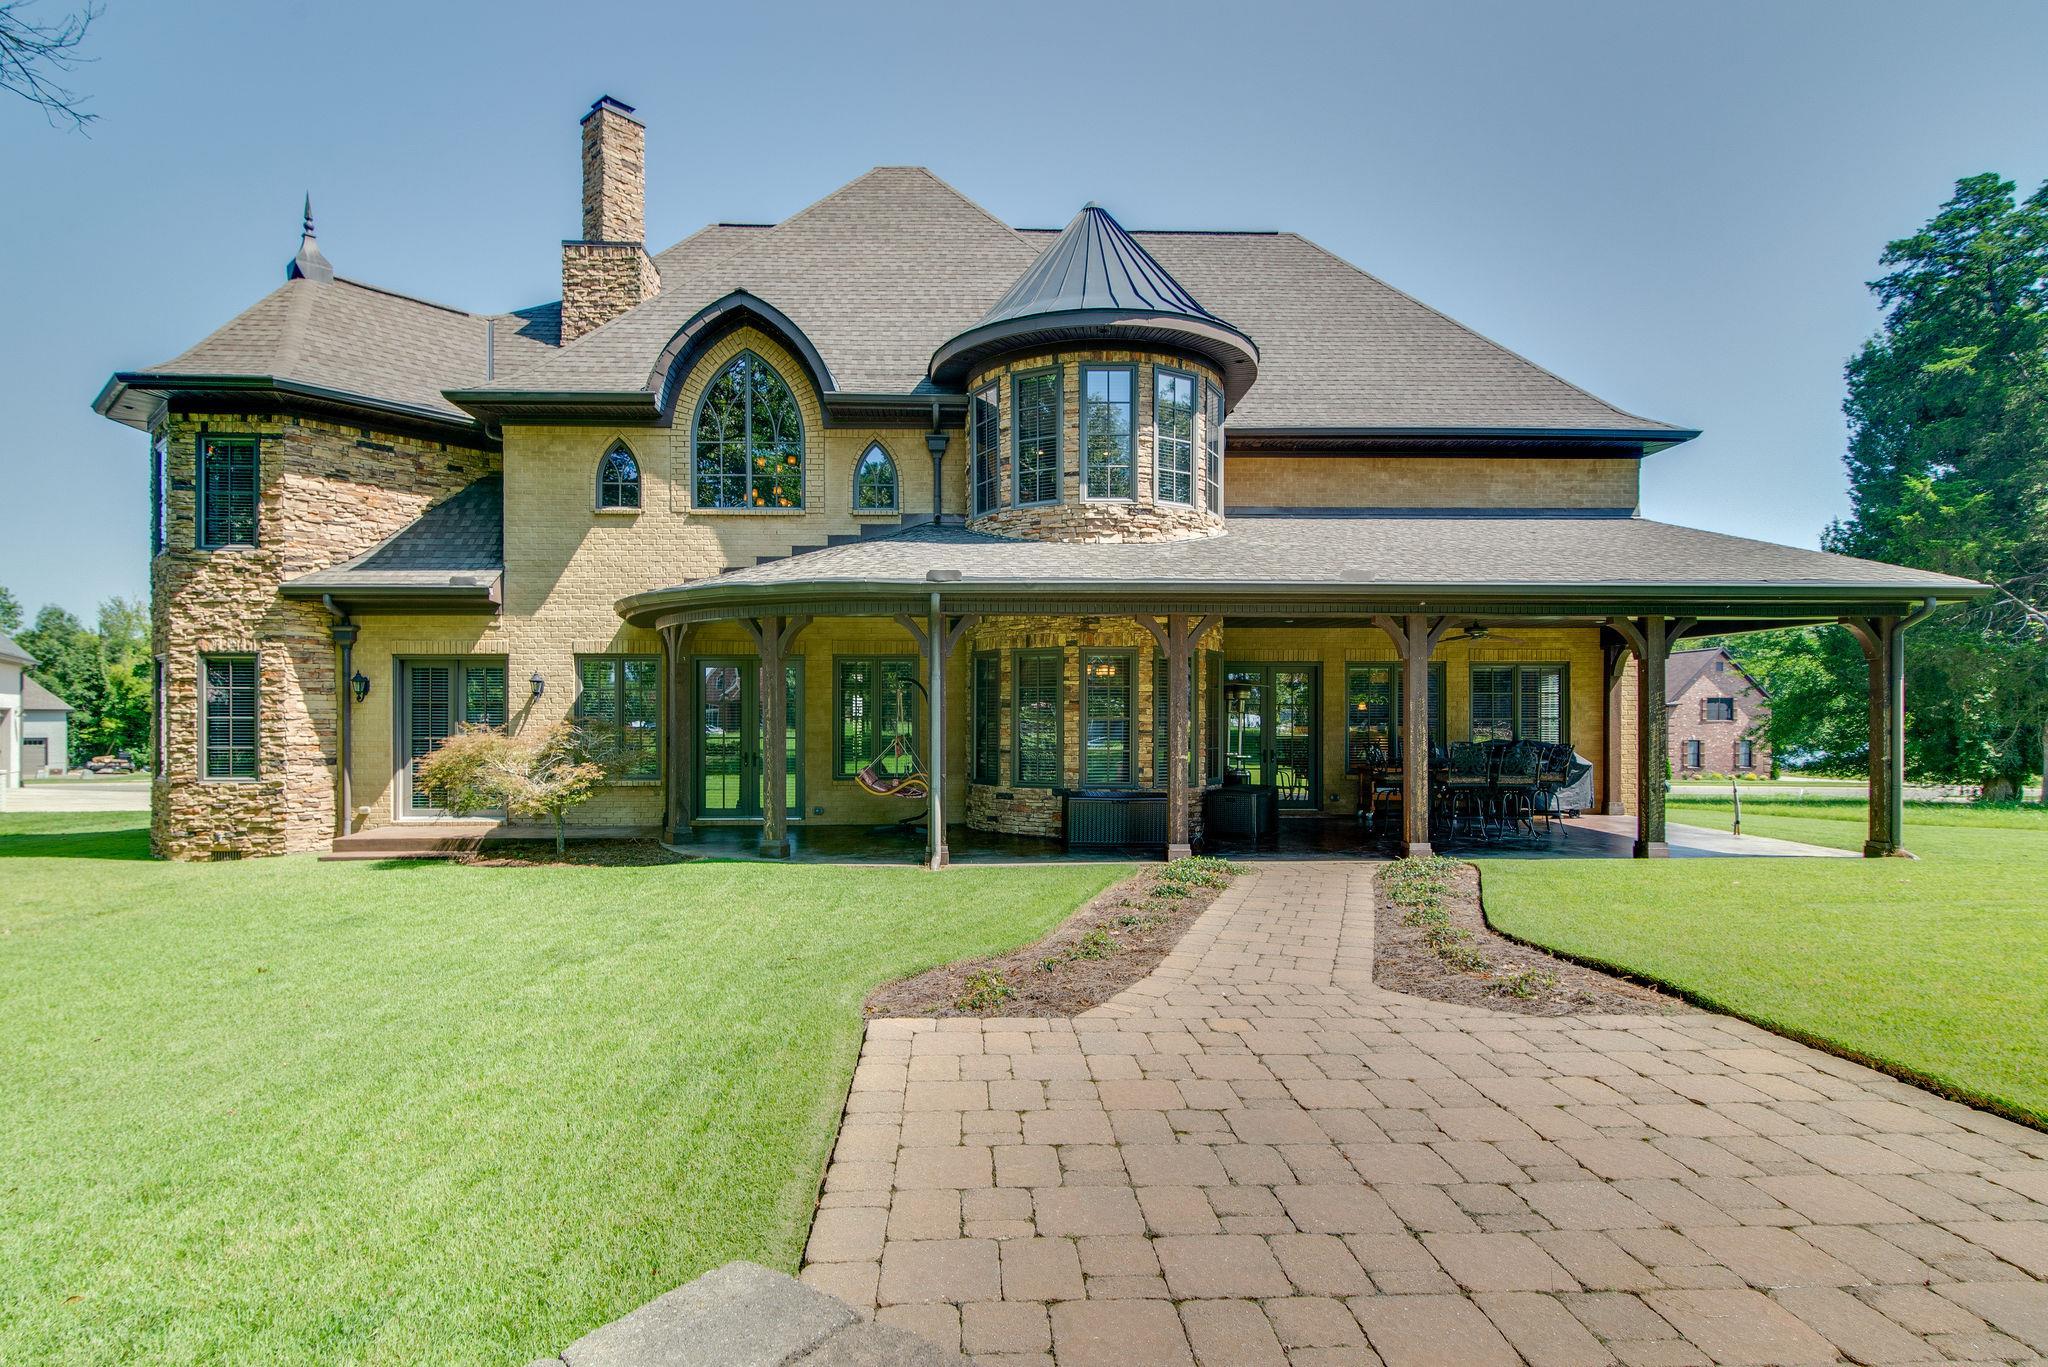 $1,250,000 - 5Br/6Ba -  for Sale in Savannah Point, Mount Juliet